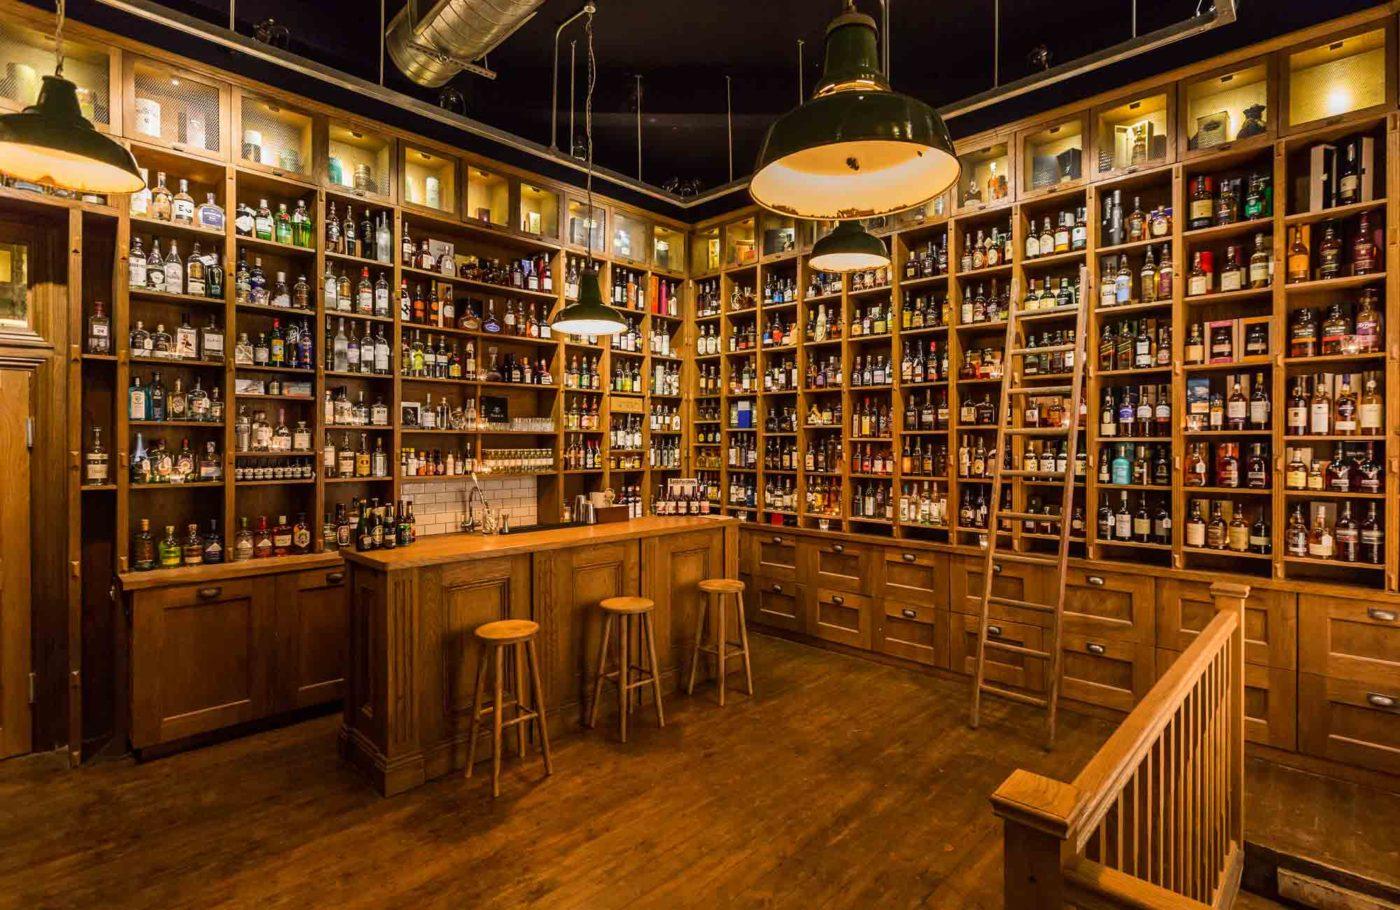 tt-liquor-liquor-store-off-licence-shoreditch-east-london